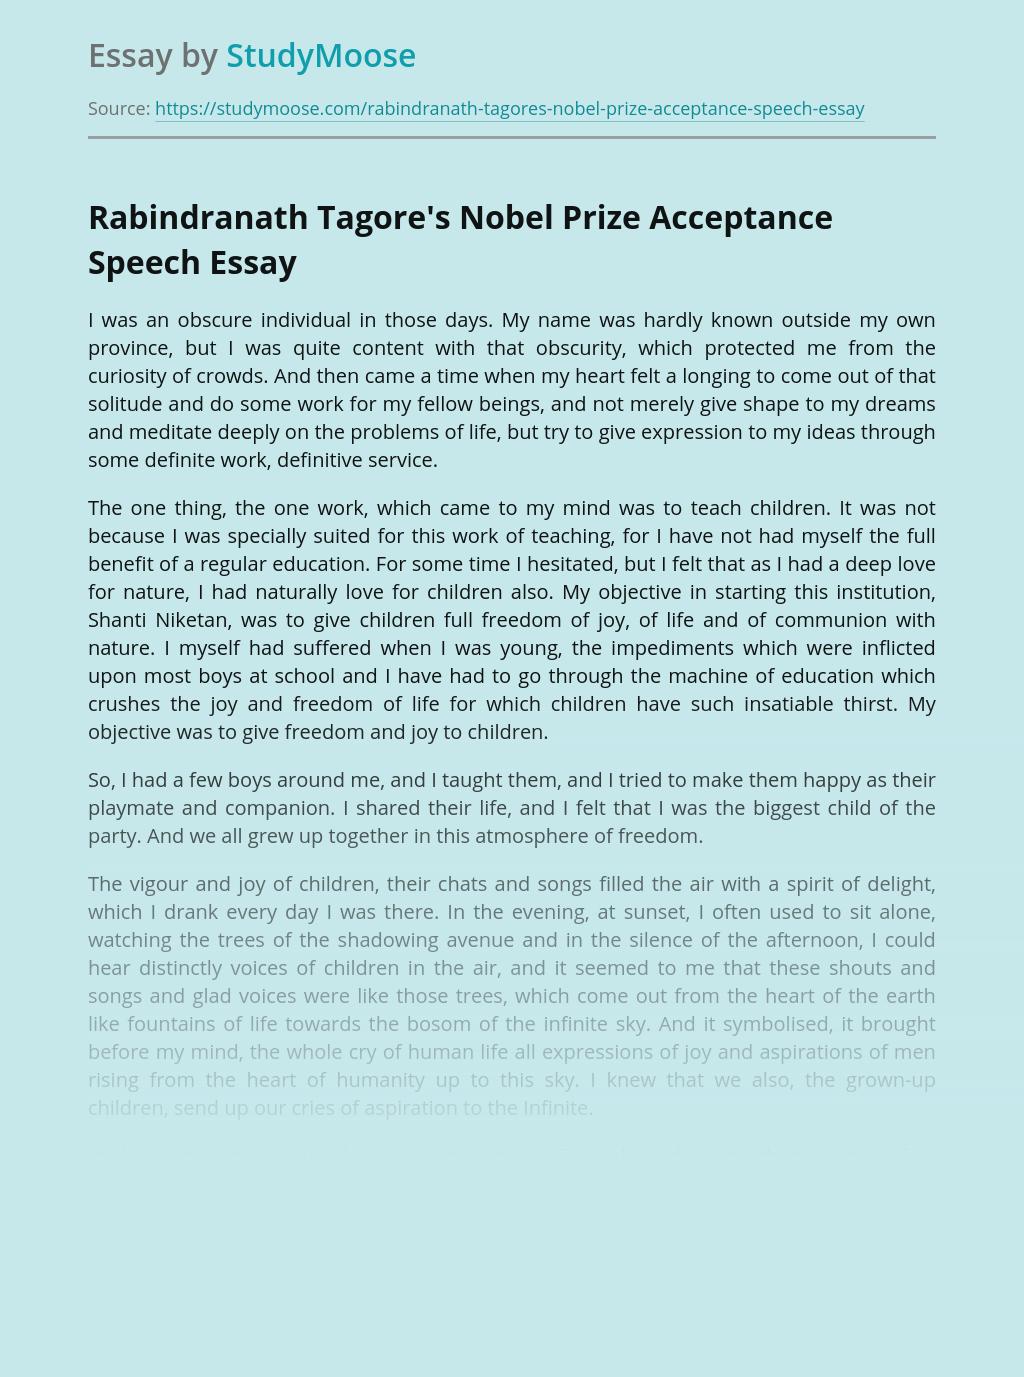 Rabindranath Tagore's Speech on Nobel Prize Distribution Ceremony